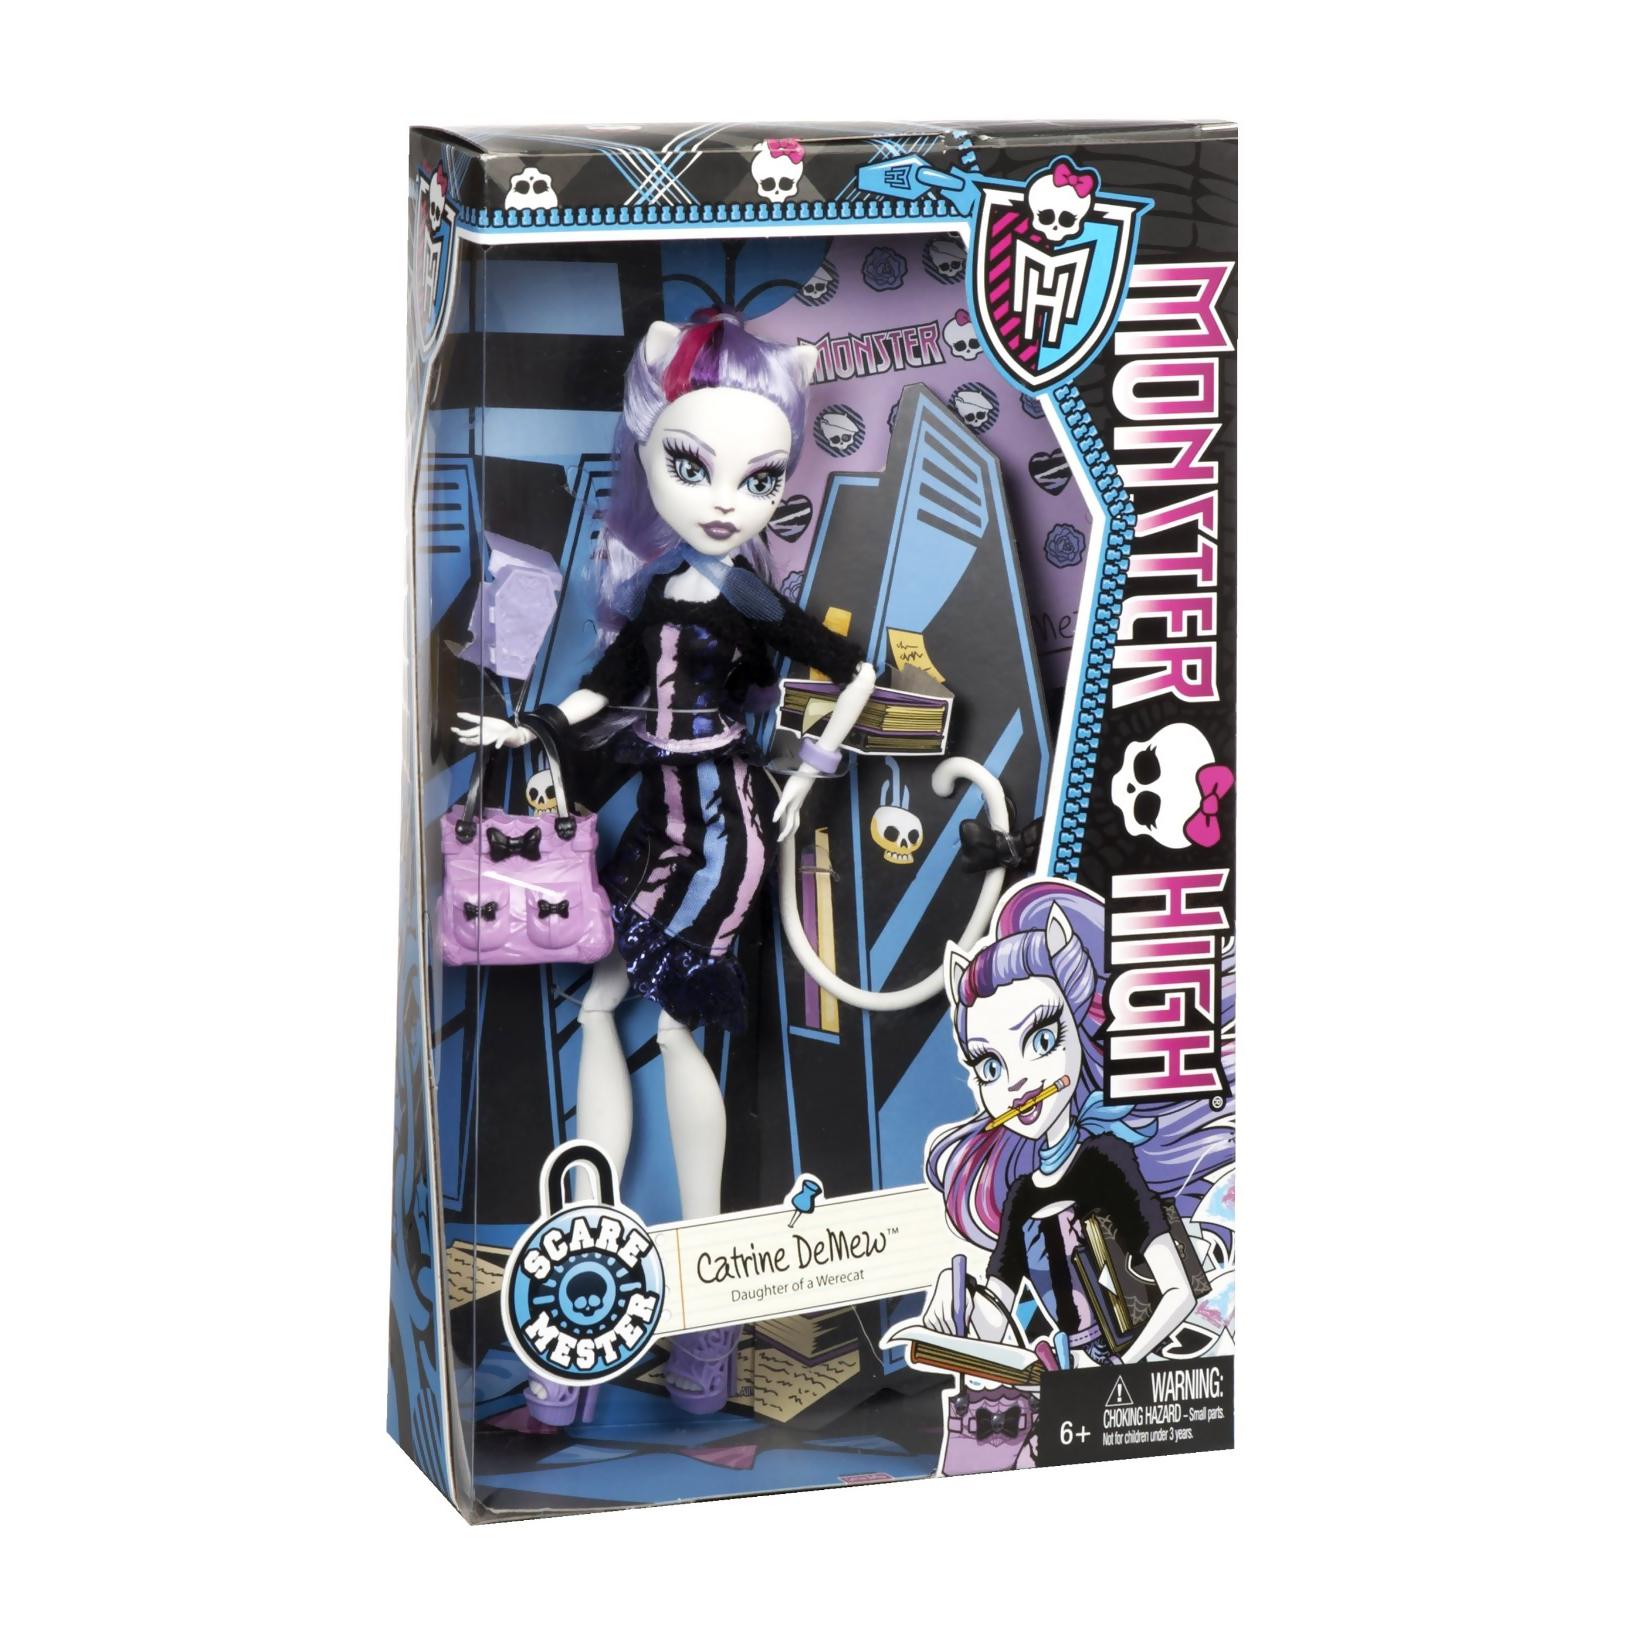 ����� Monster High �����-���� Catrin Demew